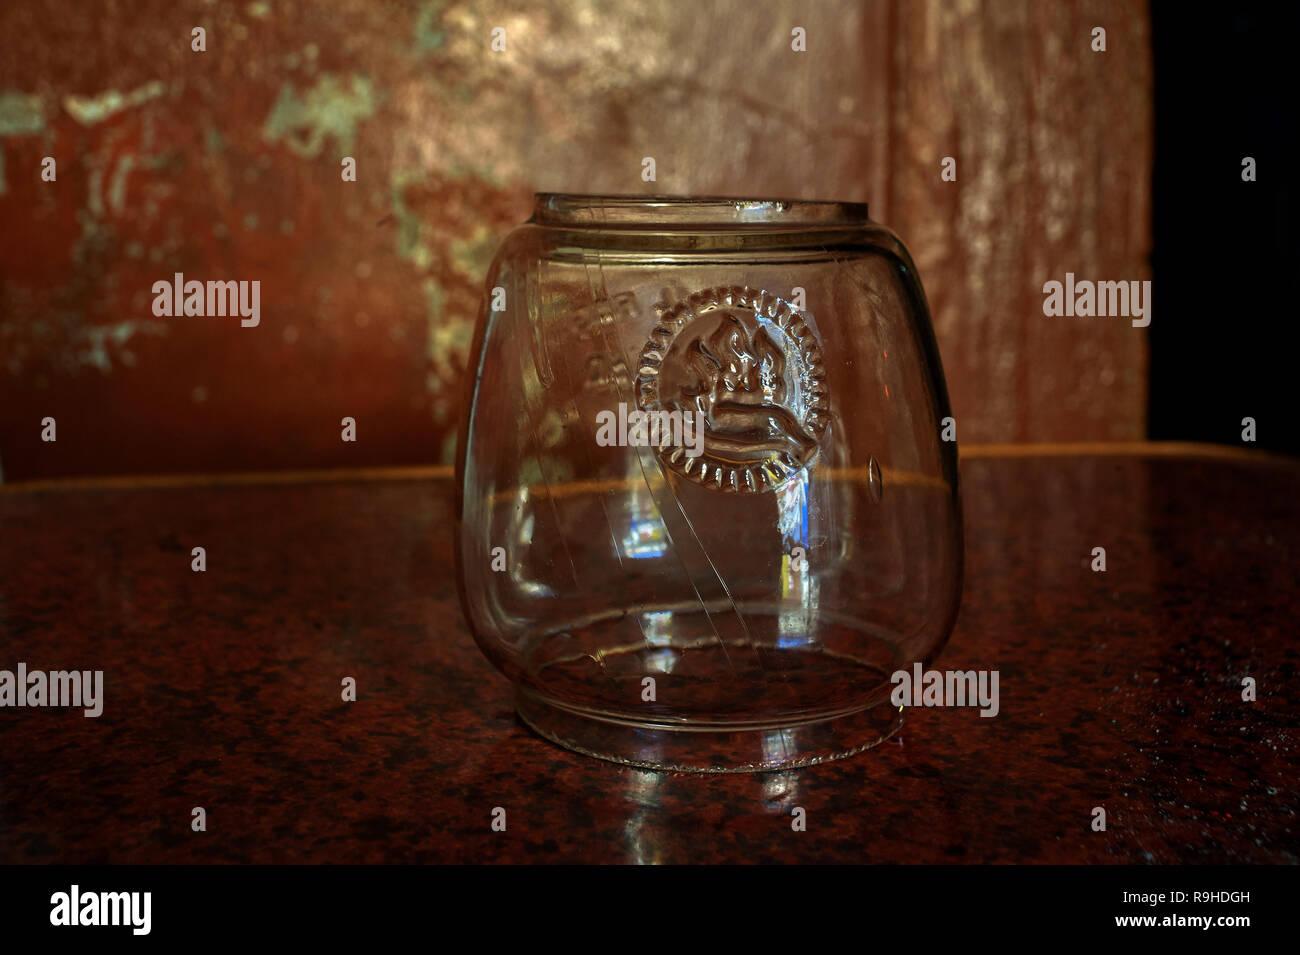 30-Jan02010 Vintage Nier Feuerhand 280 Firehand glass pot -IDAR sabarkantha District GUJARAT INDIA - Stock Image